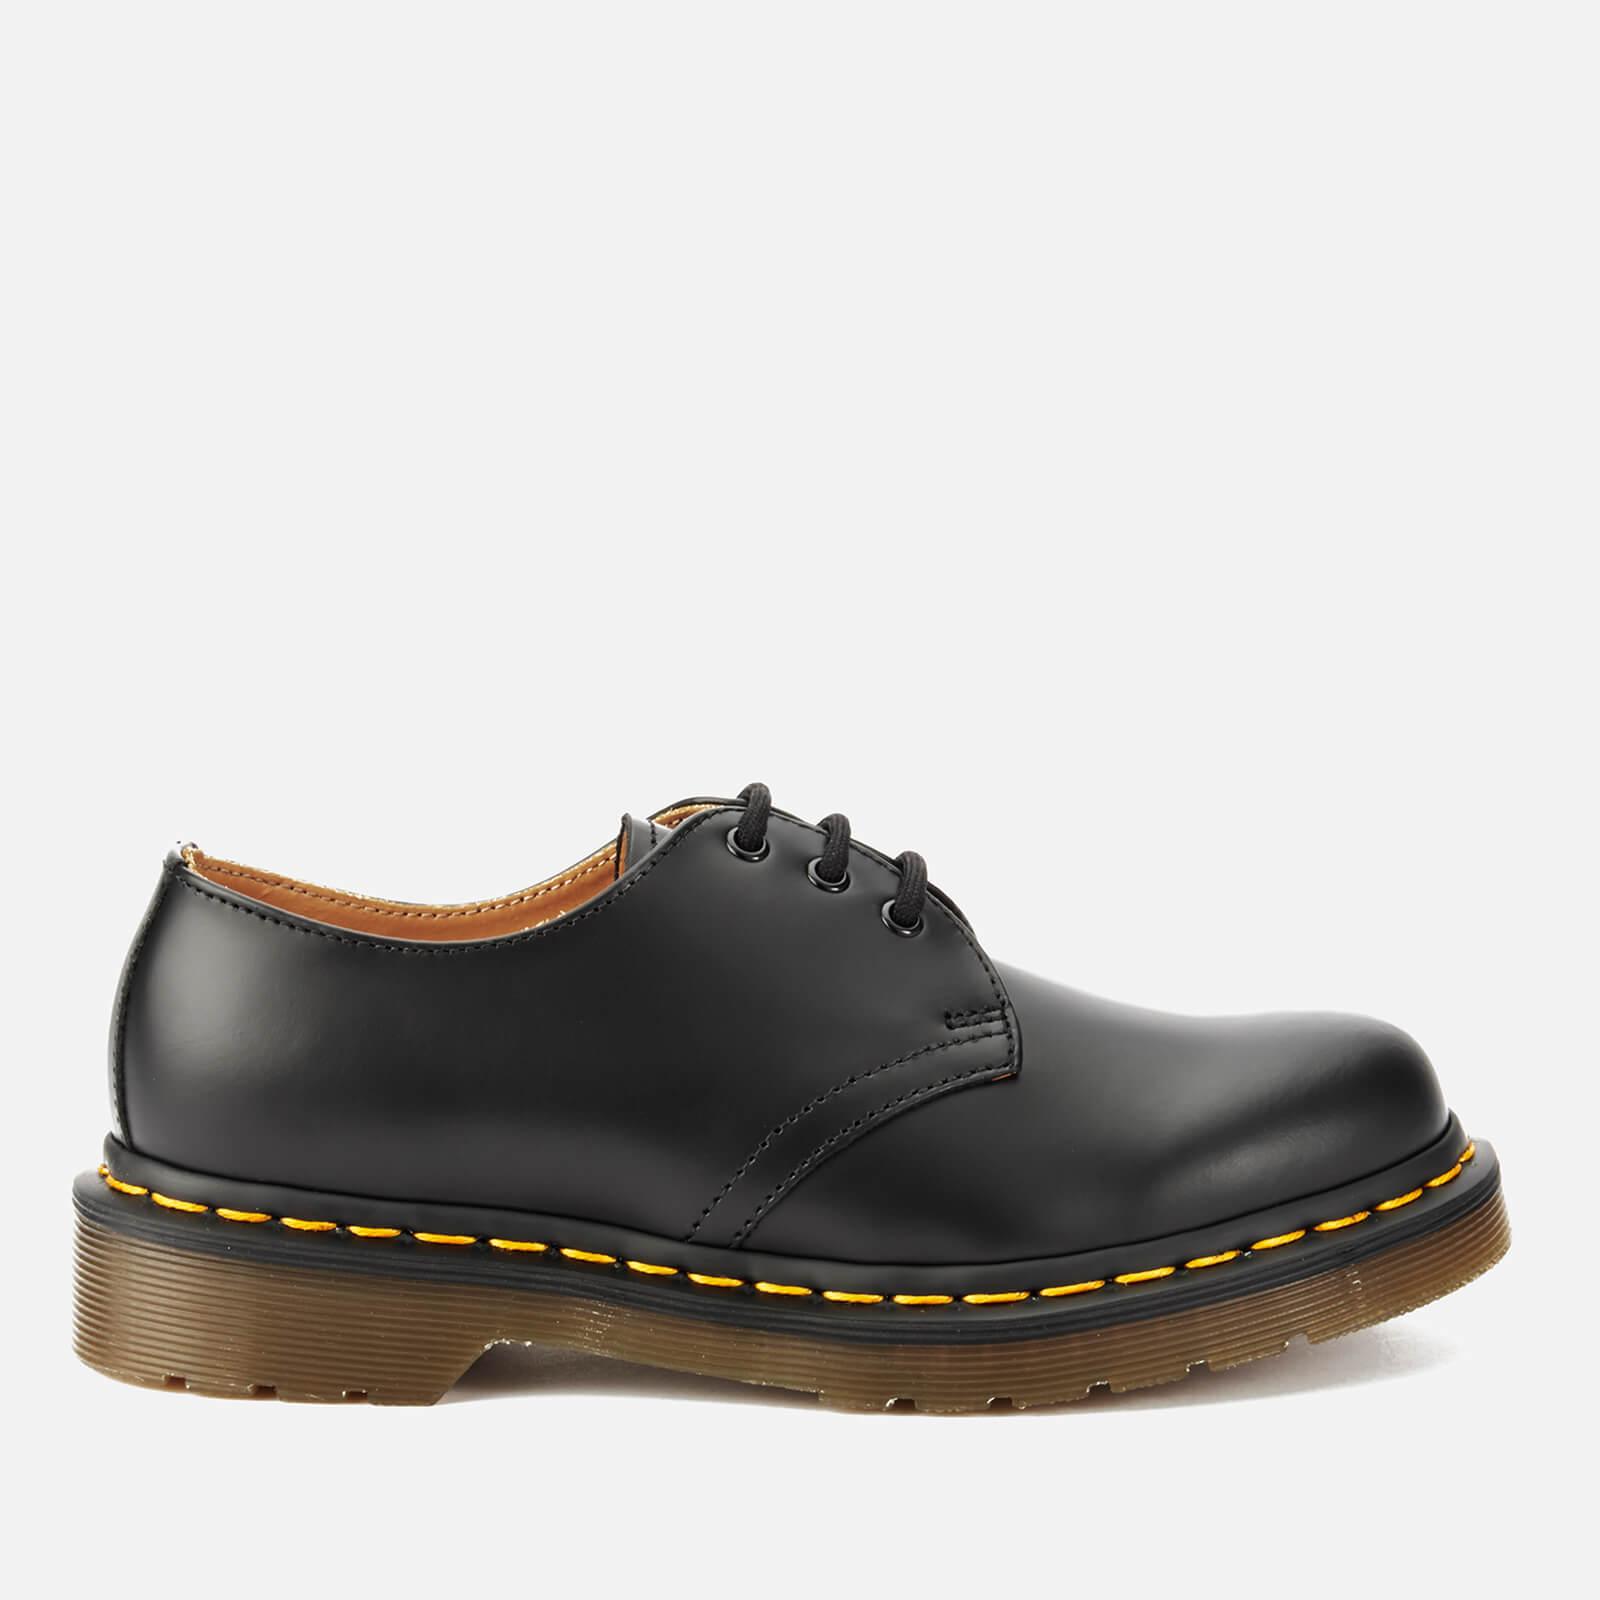 Dr. Martens 1461 Smooth Leather 3-Eye Shoes - Black - UK 10